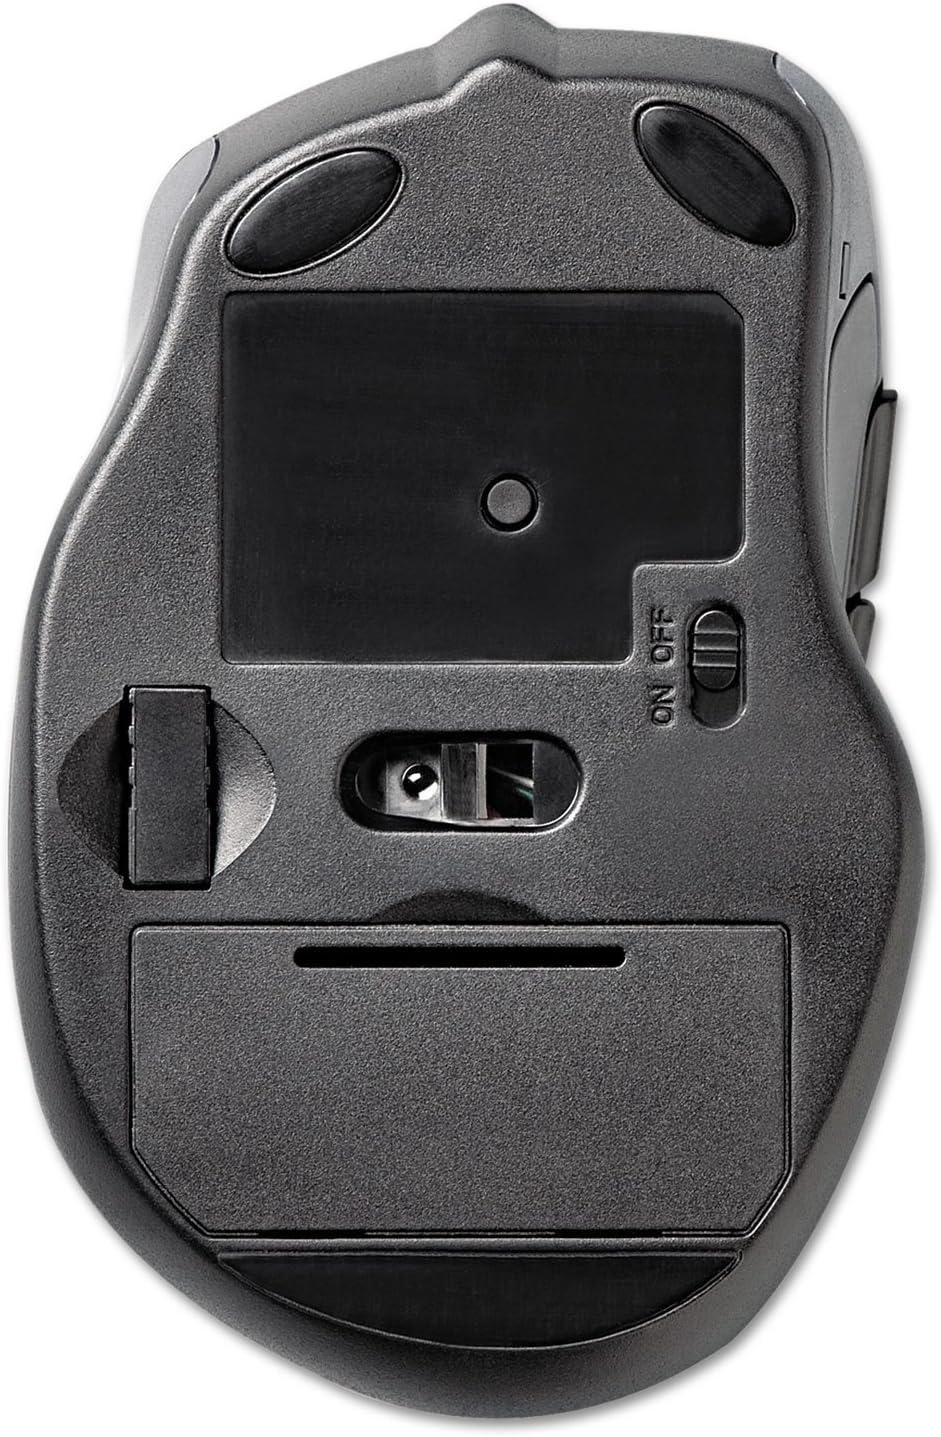 Pro Fit Mid-Size Wireless Mouse KMW72405